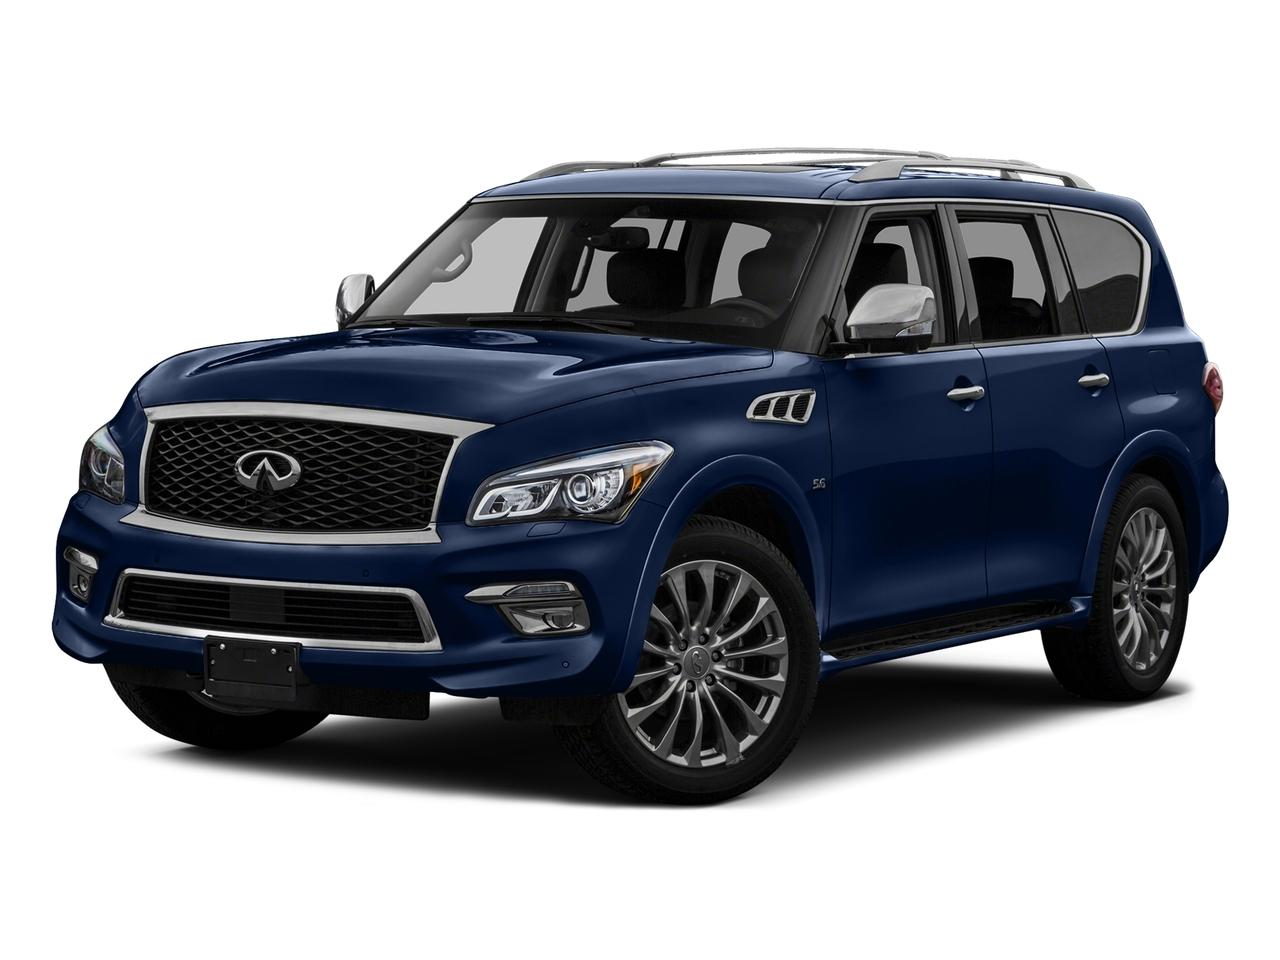 2016 INFINITI QX80 Vehicle Photo in ODESSA, TX 79762-8186